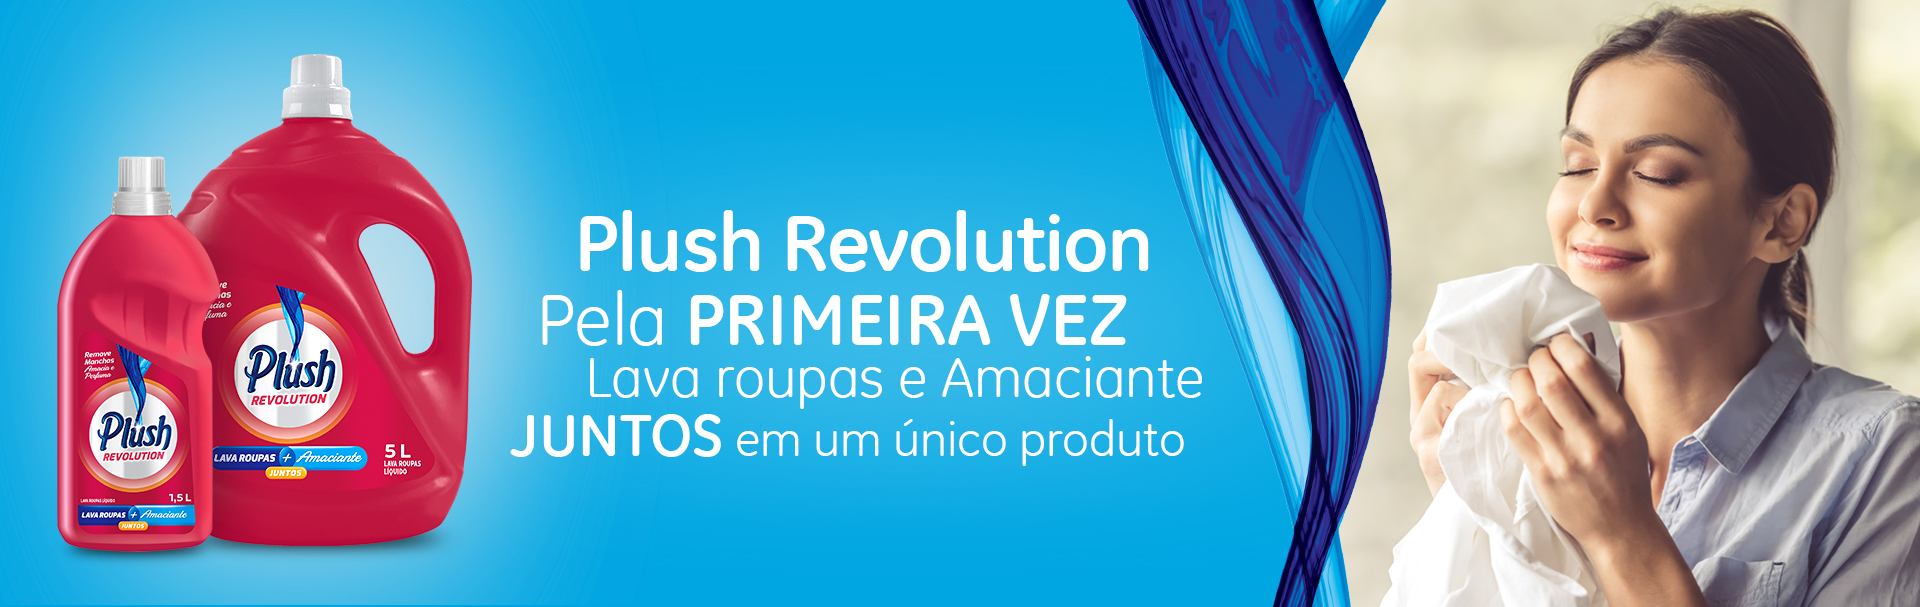 Plush Revolution - Lava Roupas e Amaciante juntos